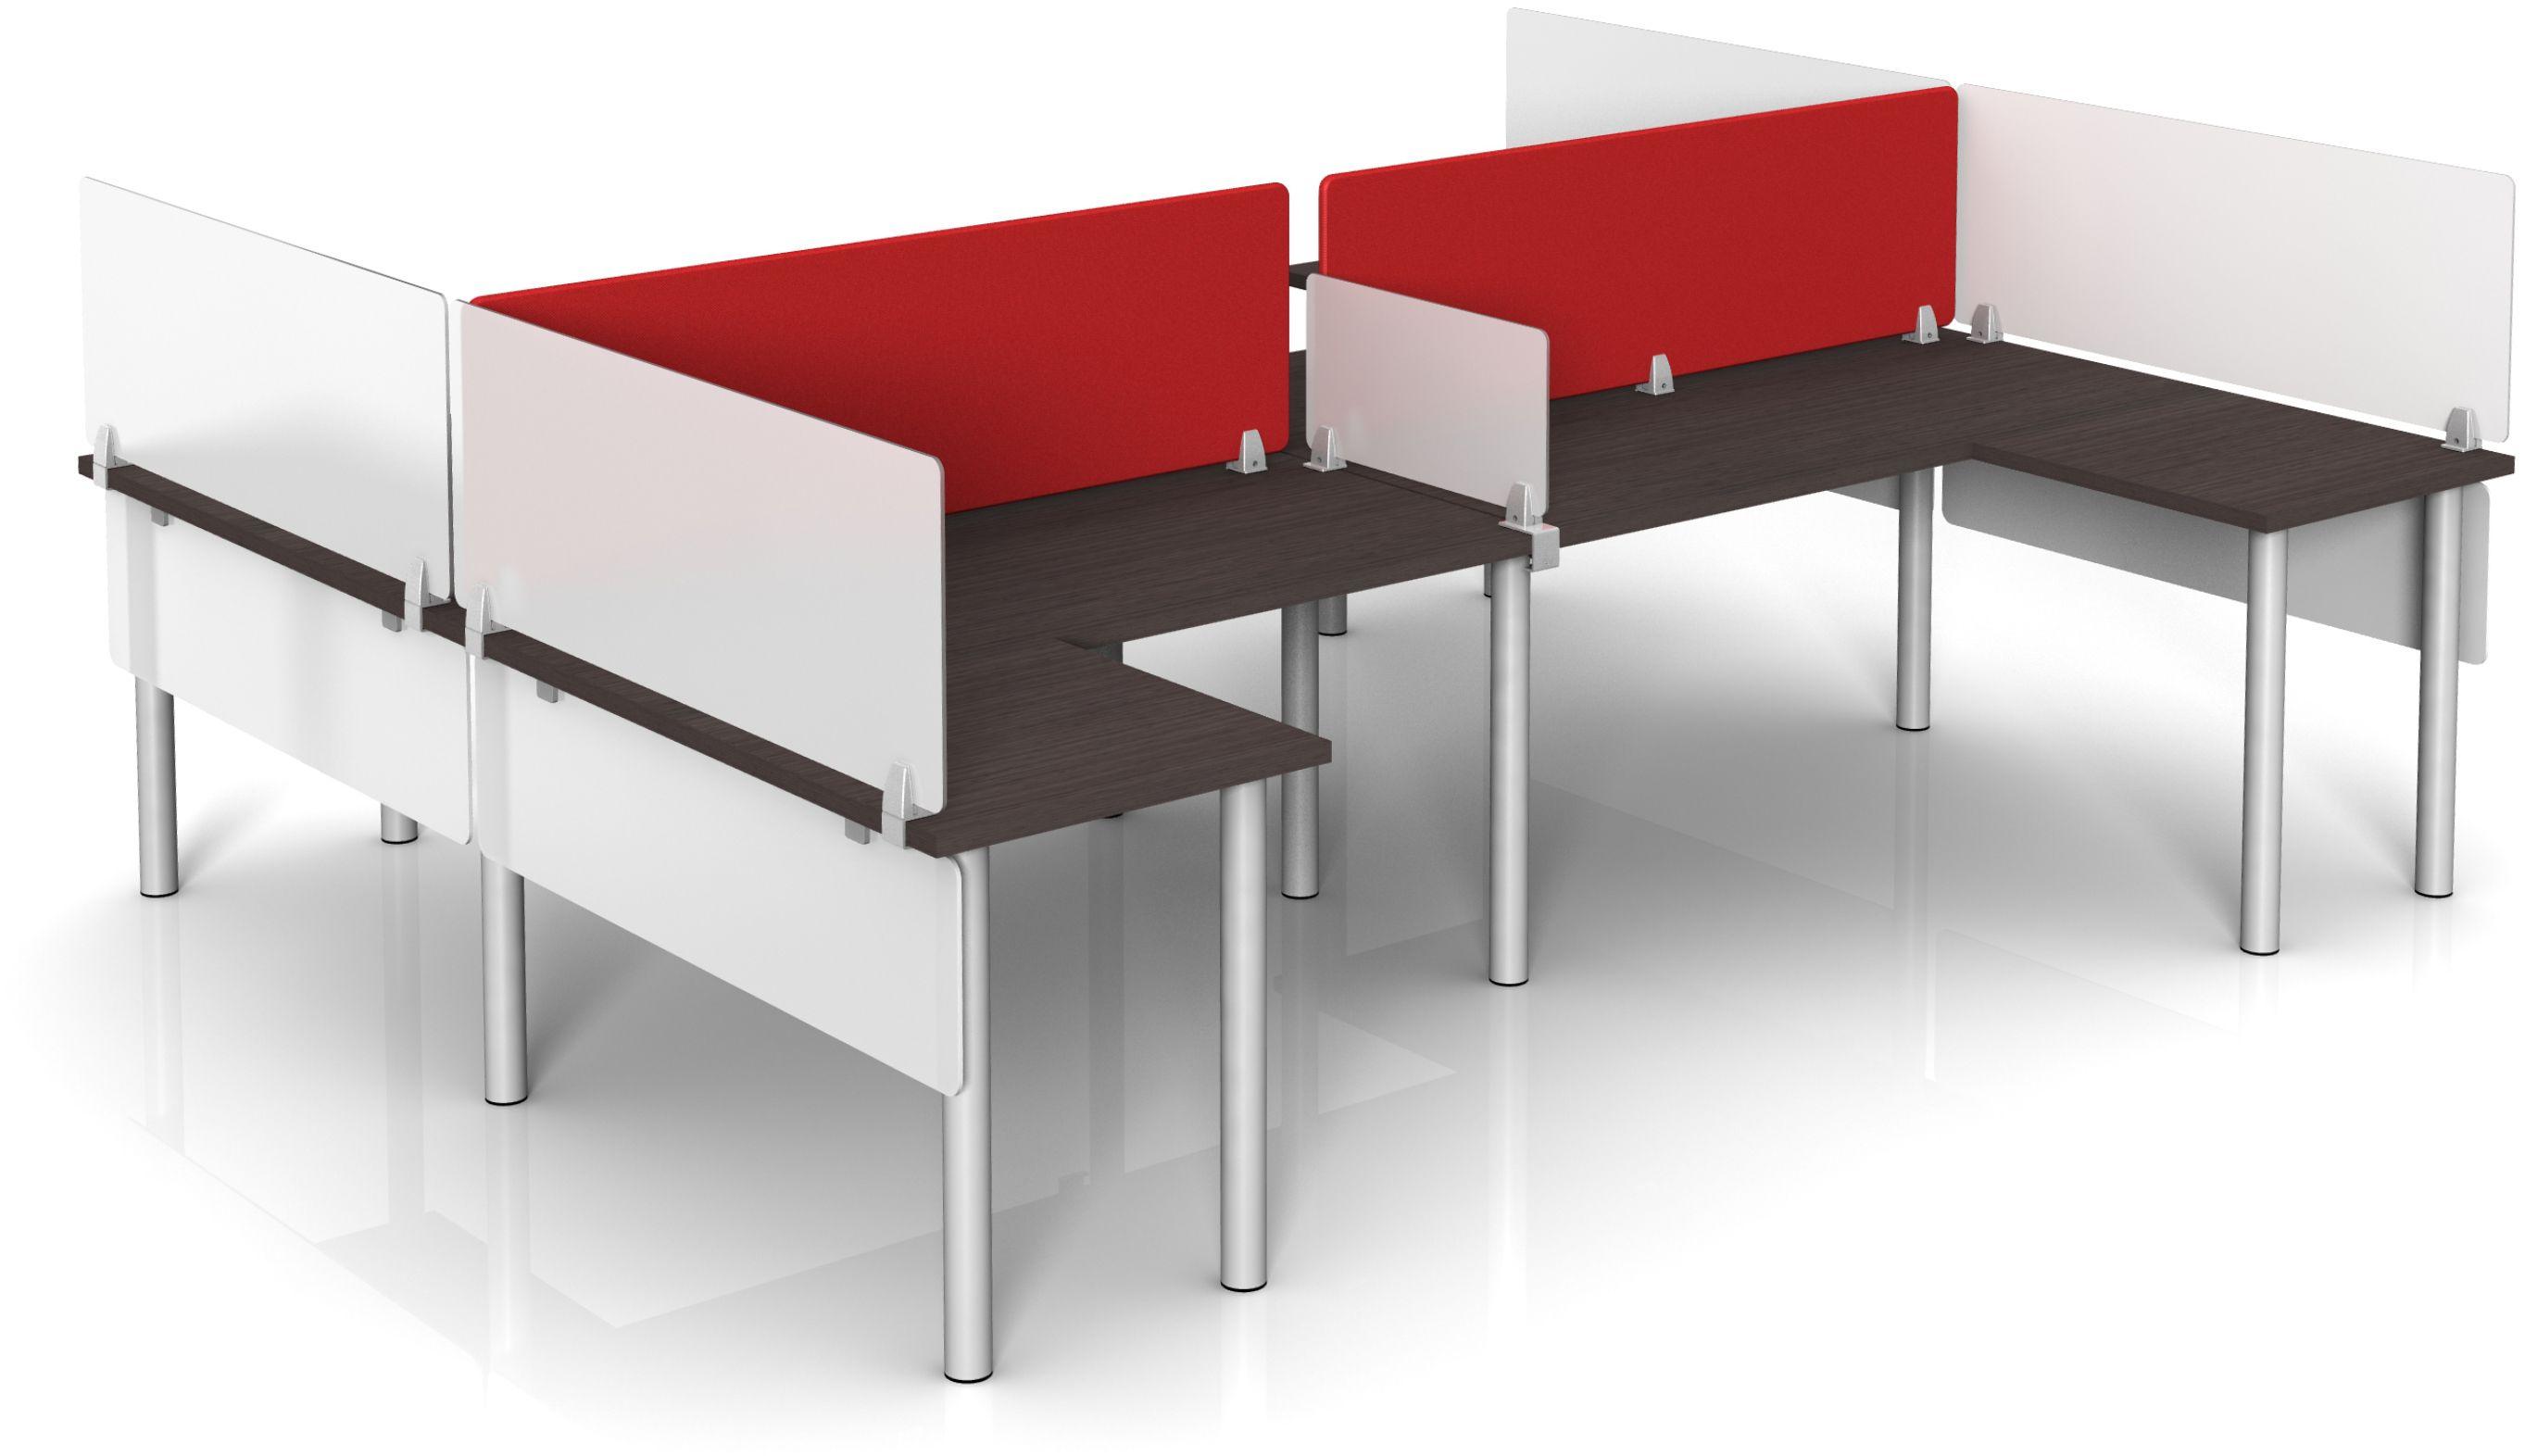 desk dividers for office design by merge works  desk dividers  - desk dividers for office design by merge works